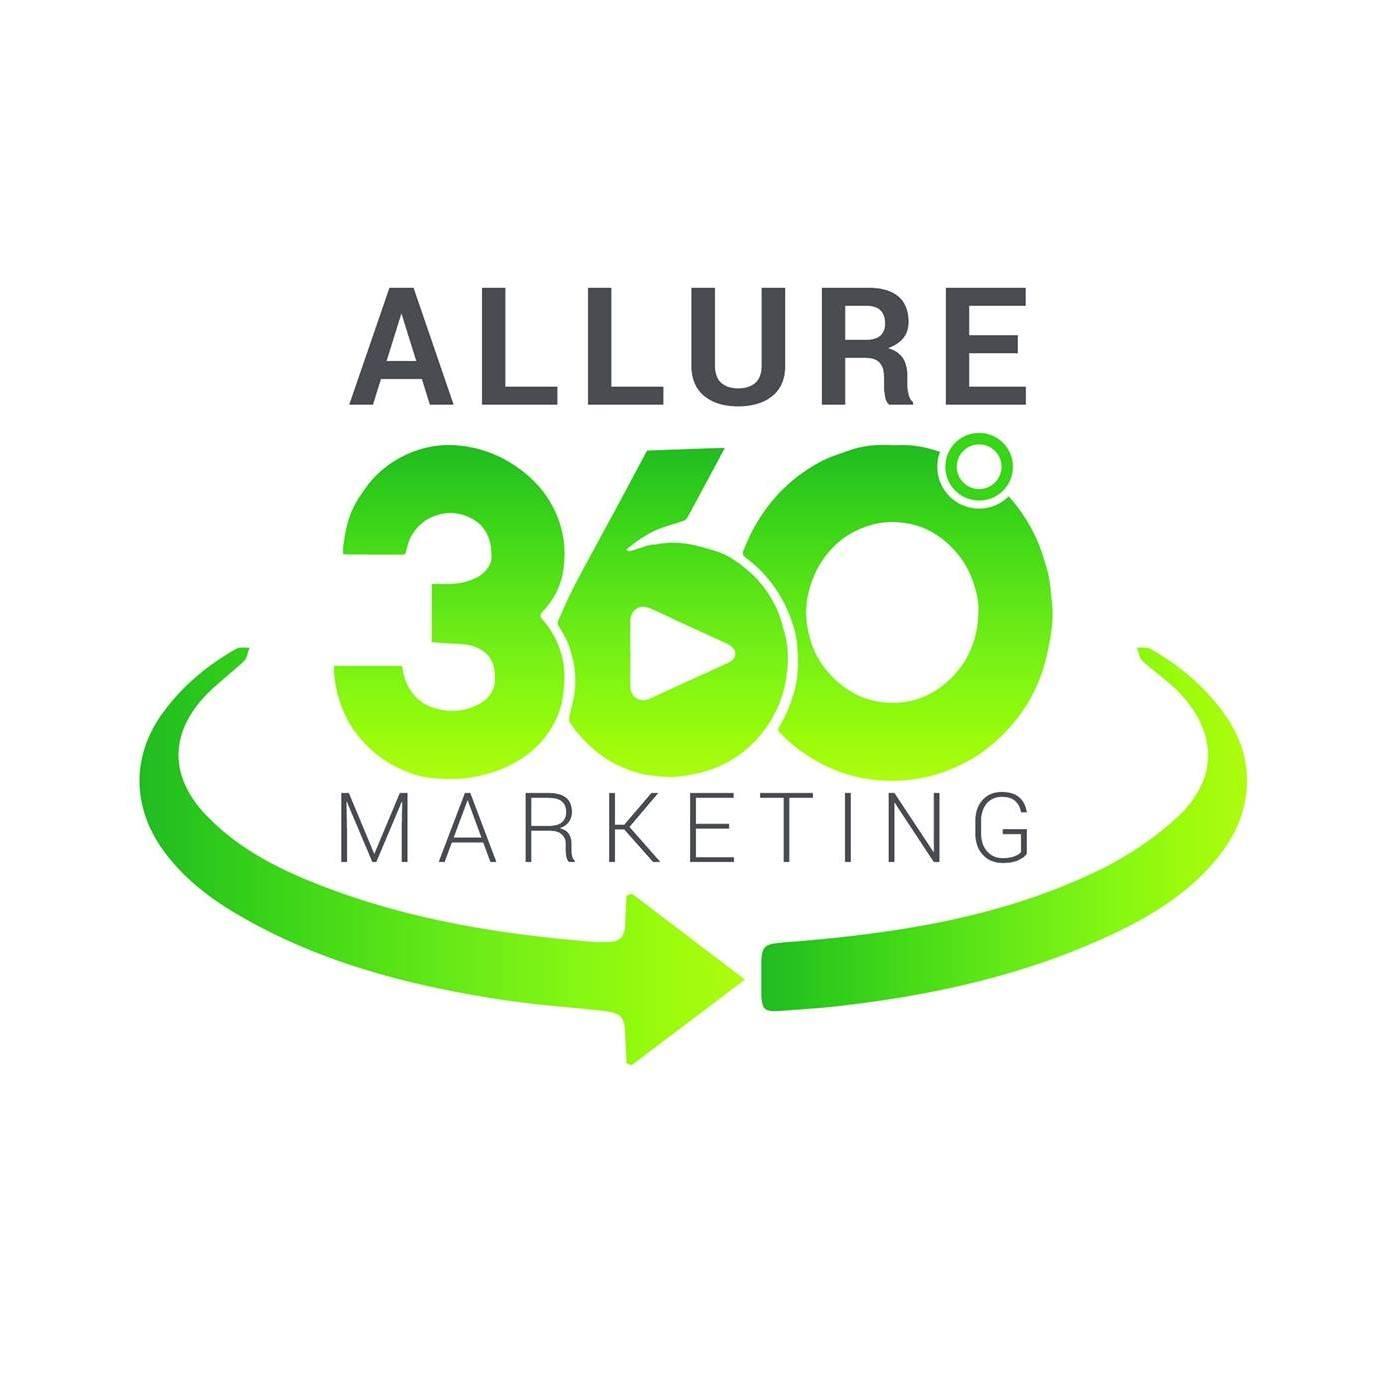 Allure360Marketing